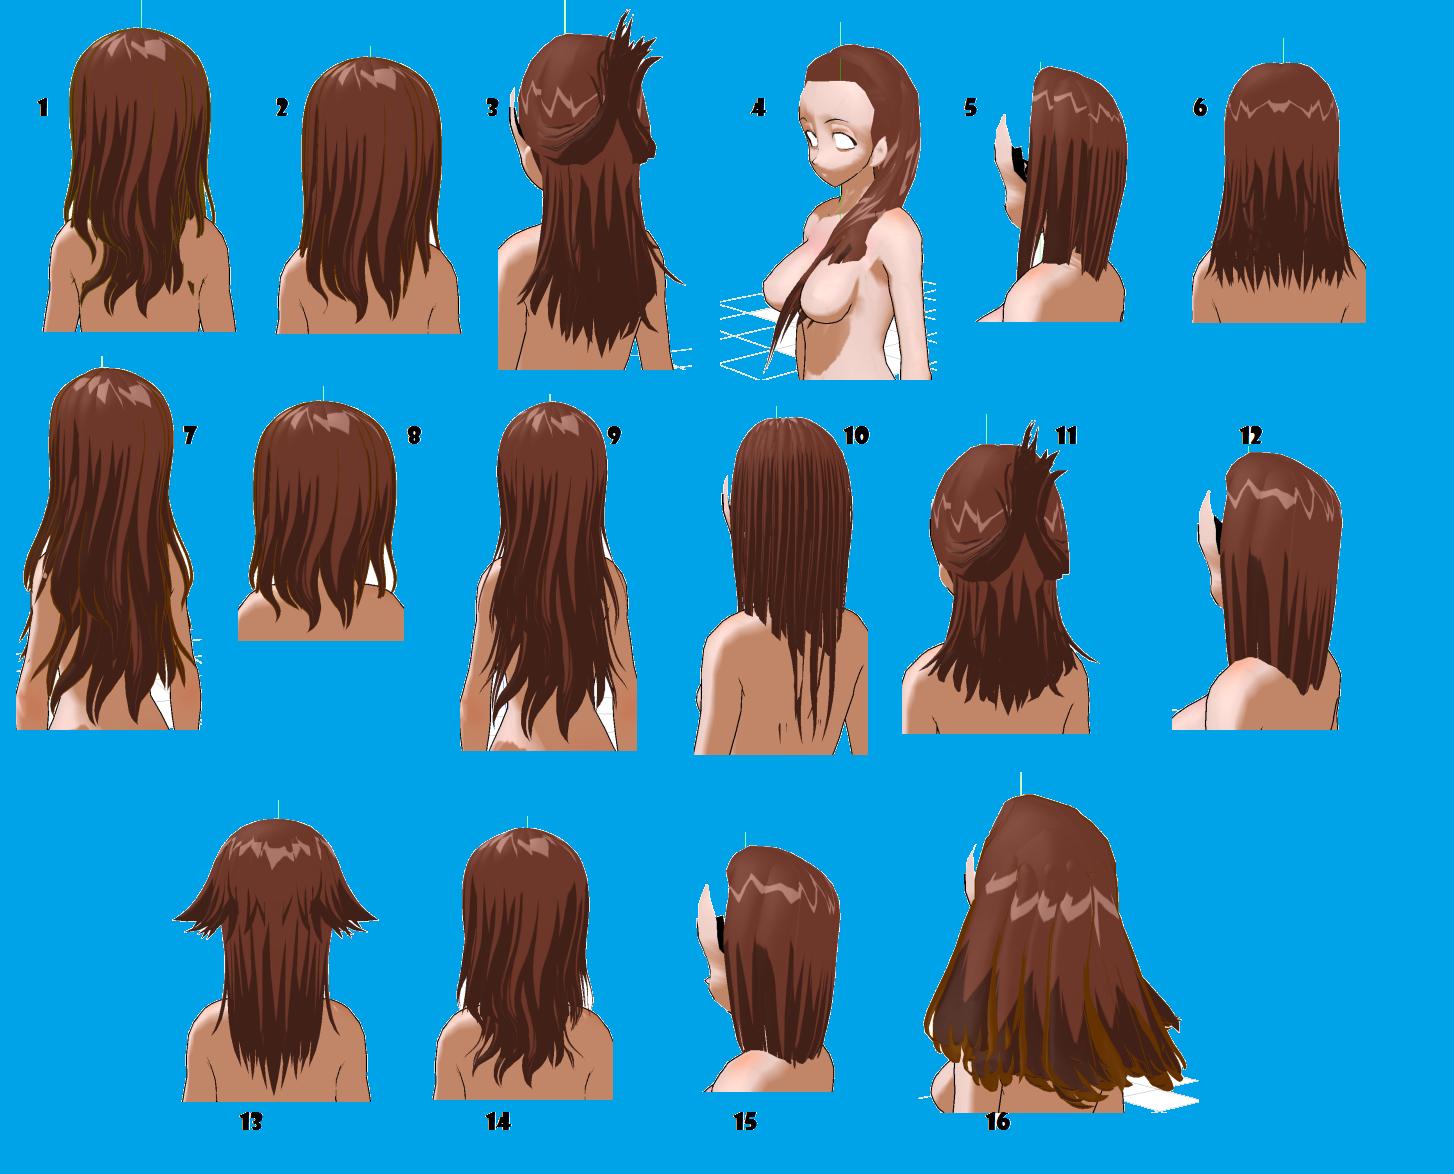 Medium Length Hair Styles By Mmdxdespair On Deviantart